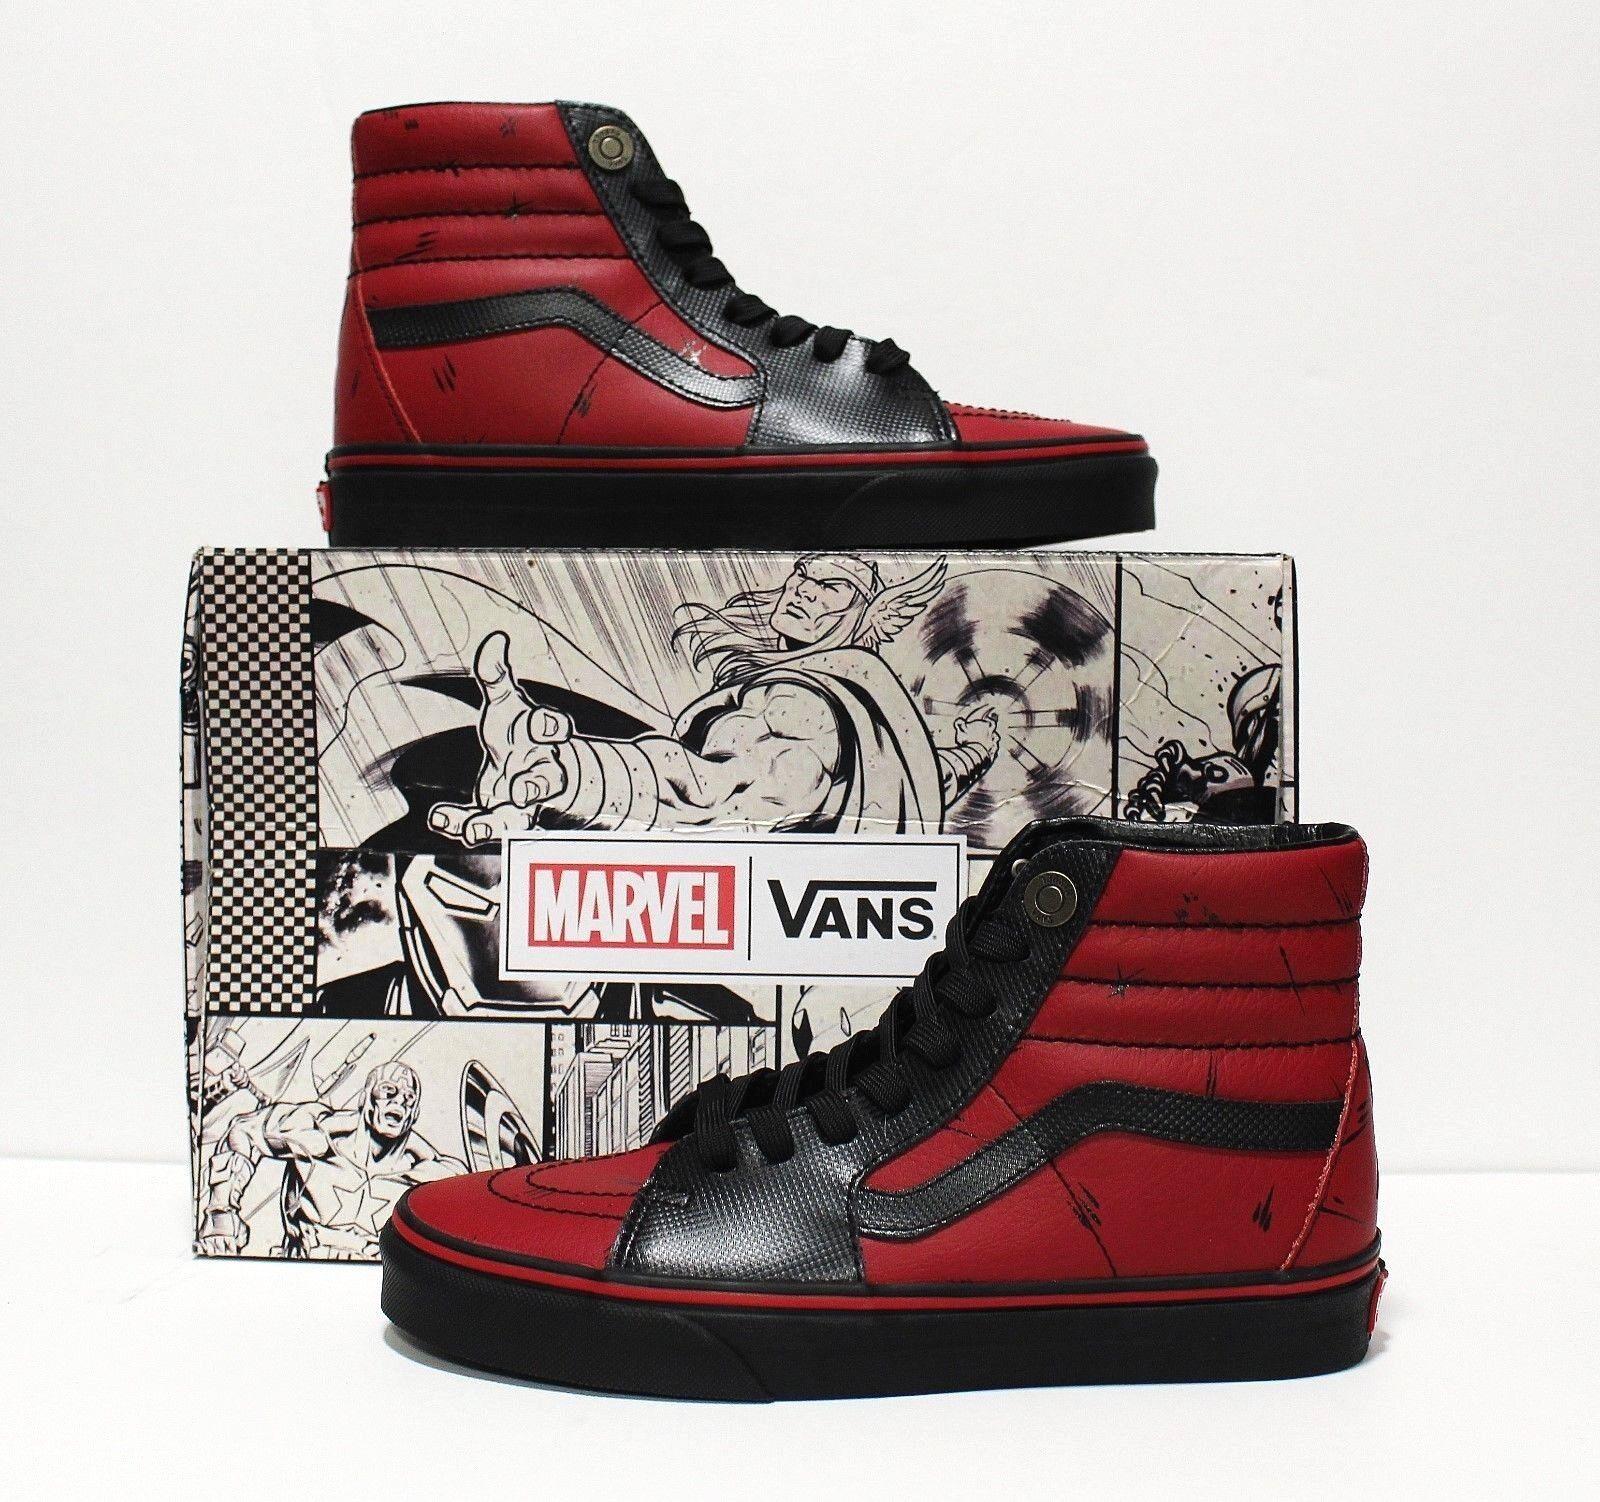 Vans X Marvel SK8 Hi Deadpool Black Men's Size 7.5 (Women's 9)